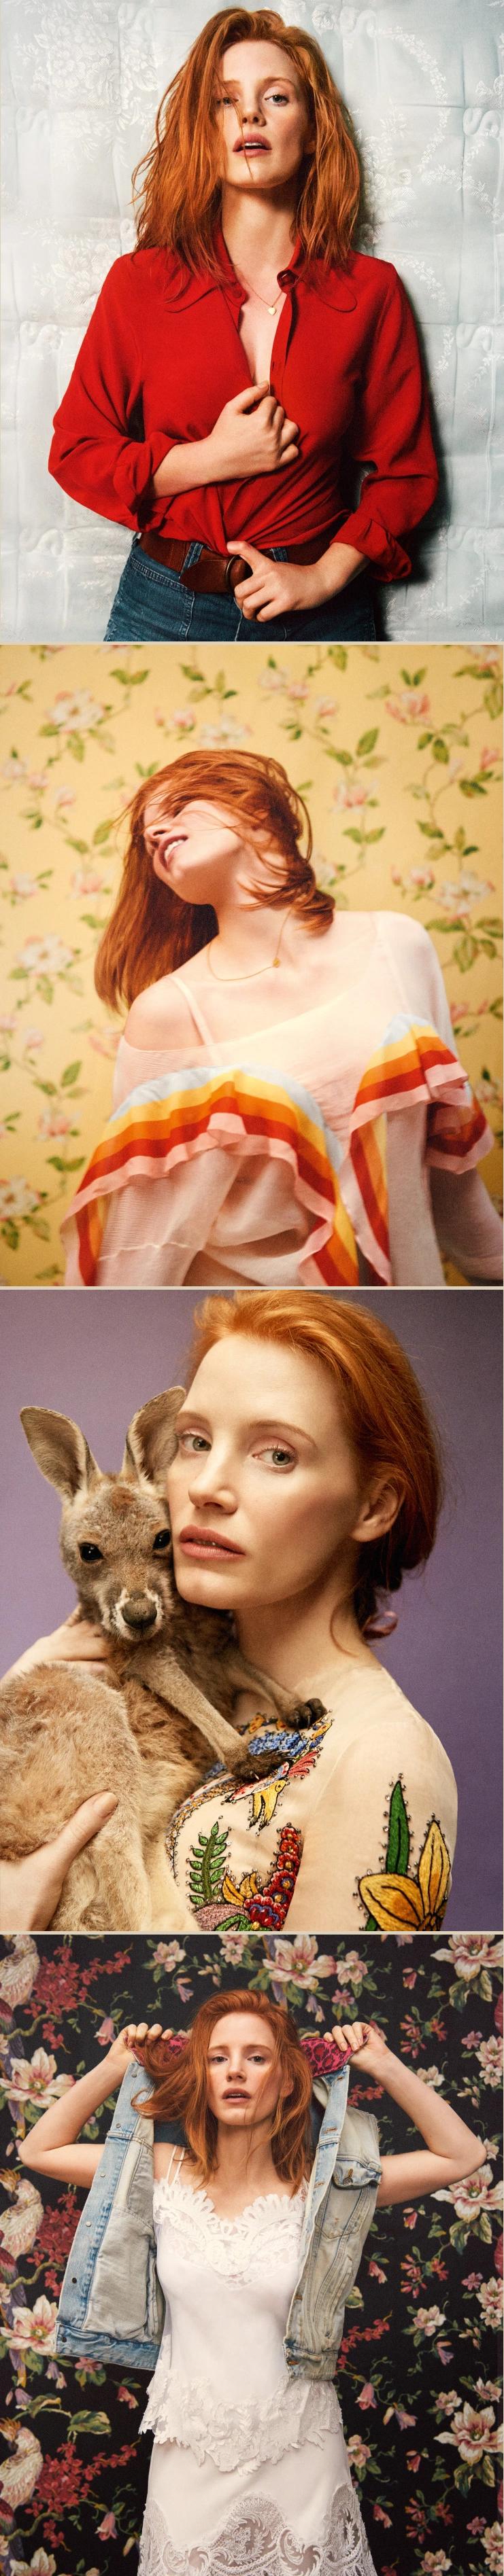 Jessica Chastain promove liberdades fashion1 - Cleon Gostinski - Fonte We Are So Droee